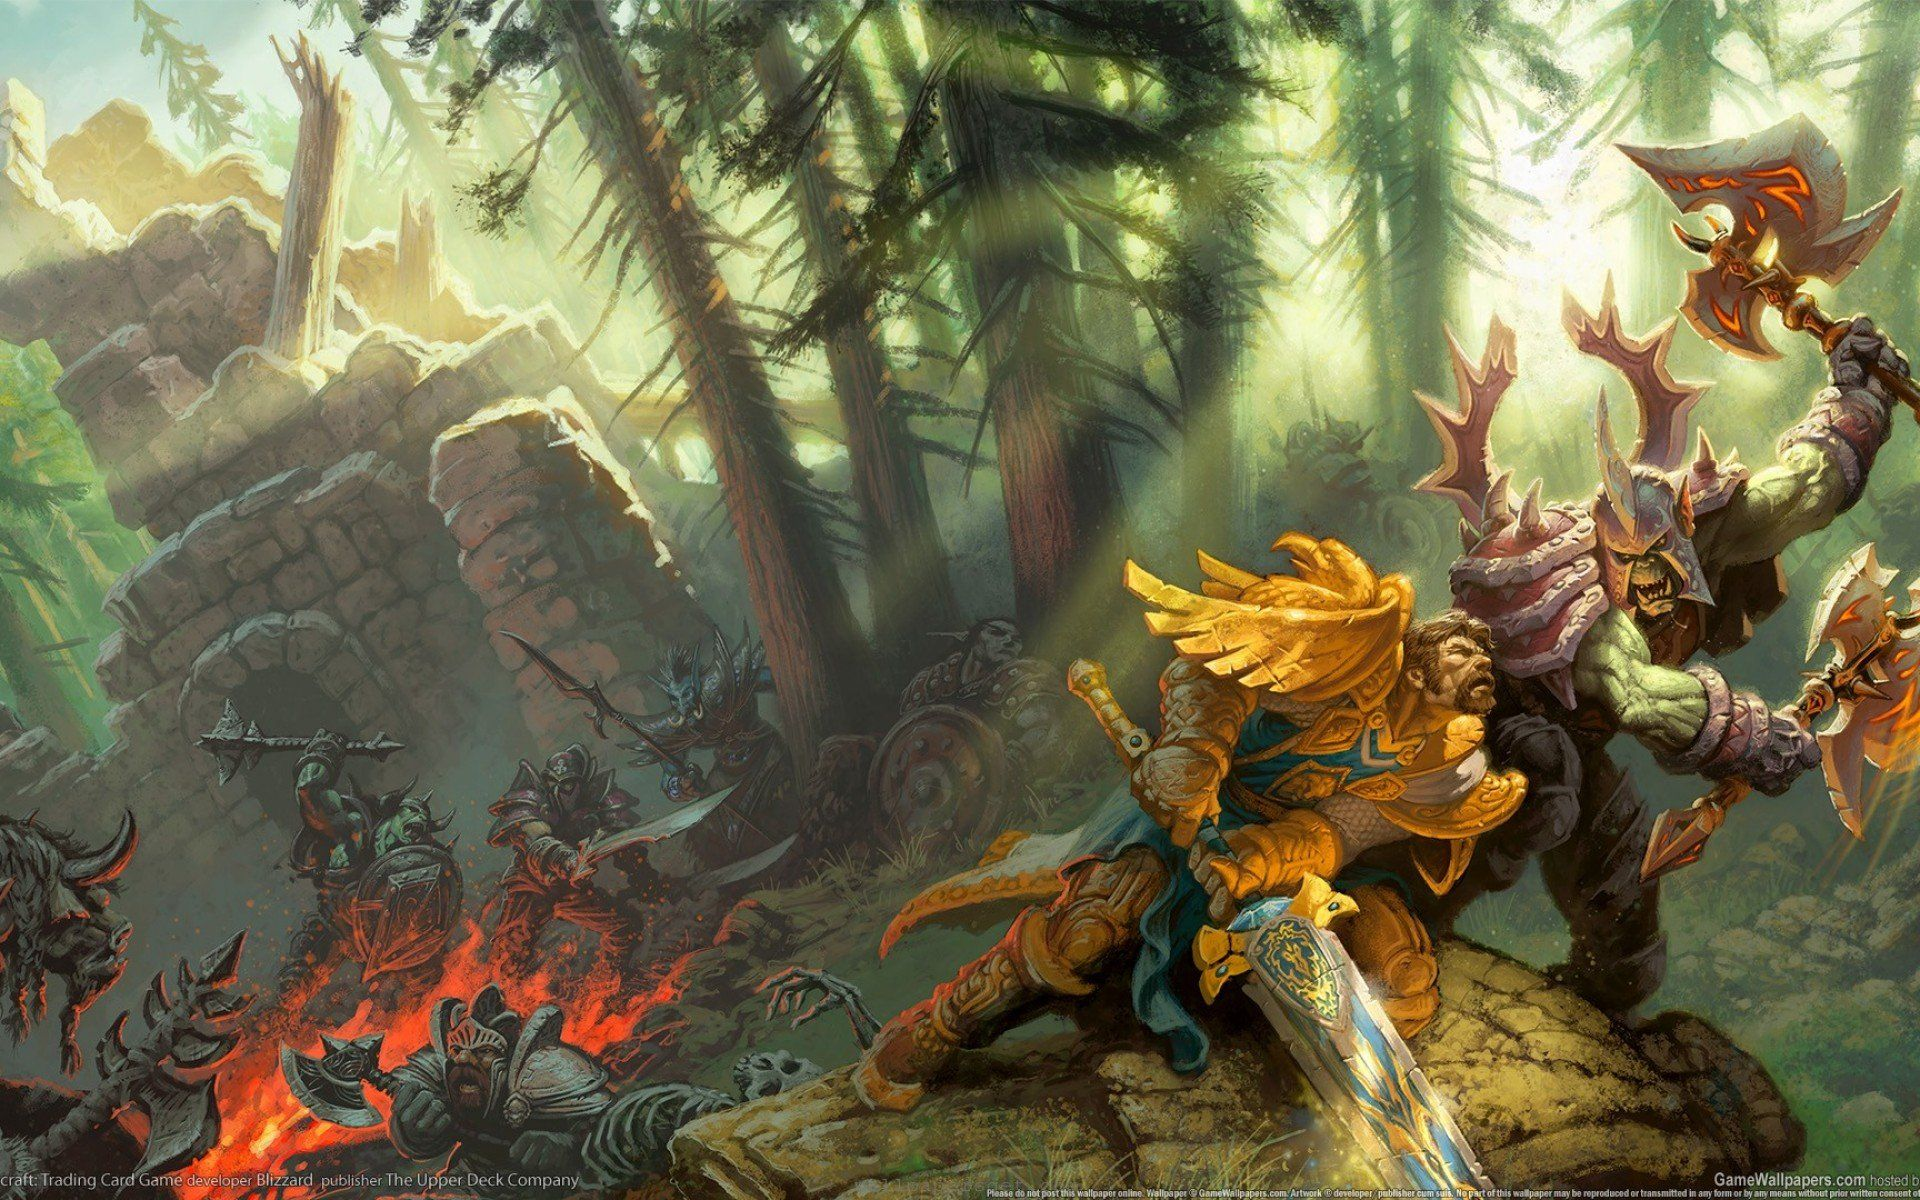 World Of Warcraft Fan Art Wallpaper Wallpaper World Of Warcraft Wallpaper Warcraft Art World Of Warcraft Game